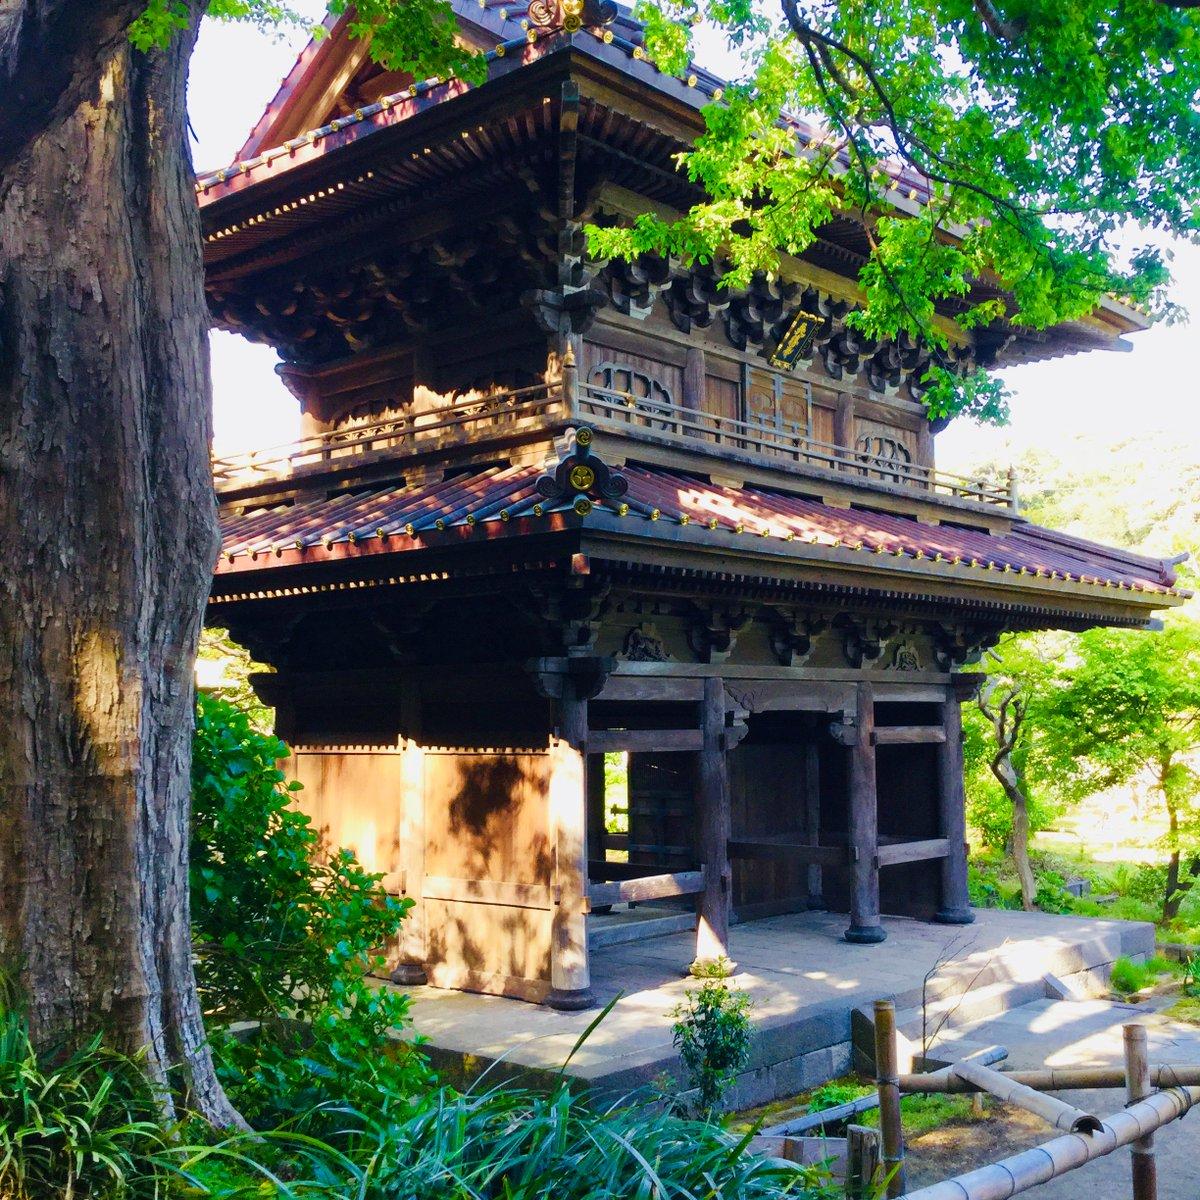 test ツイッターメディア - 【日本遺産】構成文化財ちょこっと紹介シリーズ。 横須賀線の車窓から白壁が見える英勝寺。 一歩中に入ると、落ち着いた品のある佇まいの、鎌倉唯一の尼寺です。 四季折々の花が楽しめますが、今は白藤が見頃です♪ #鎌倉 #花 https://t.co/KbWVgKHxeI